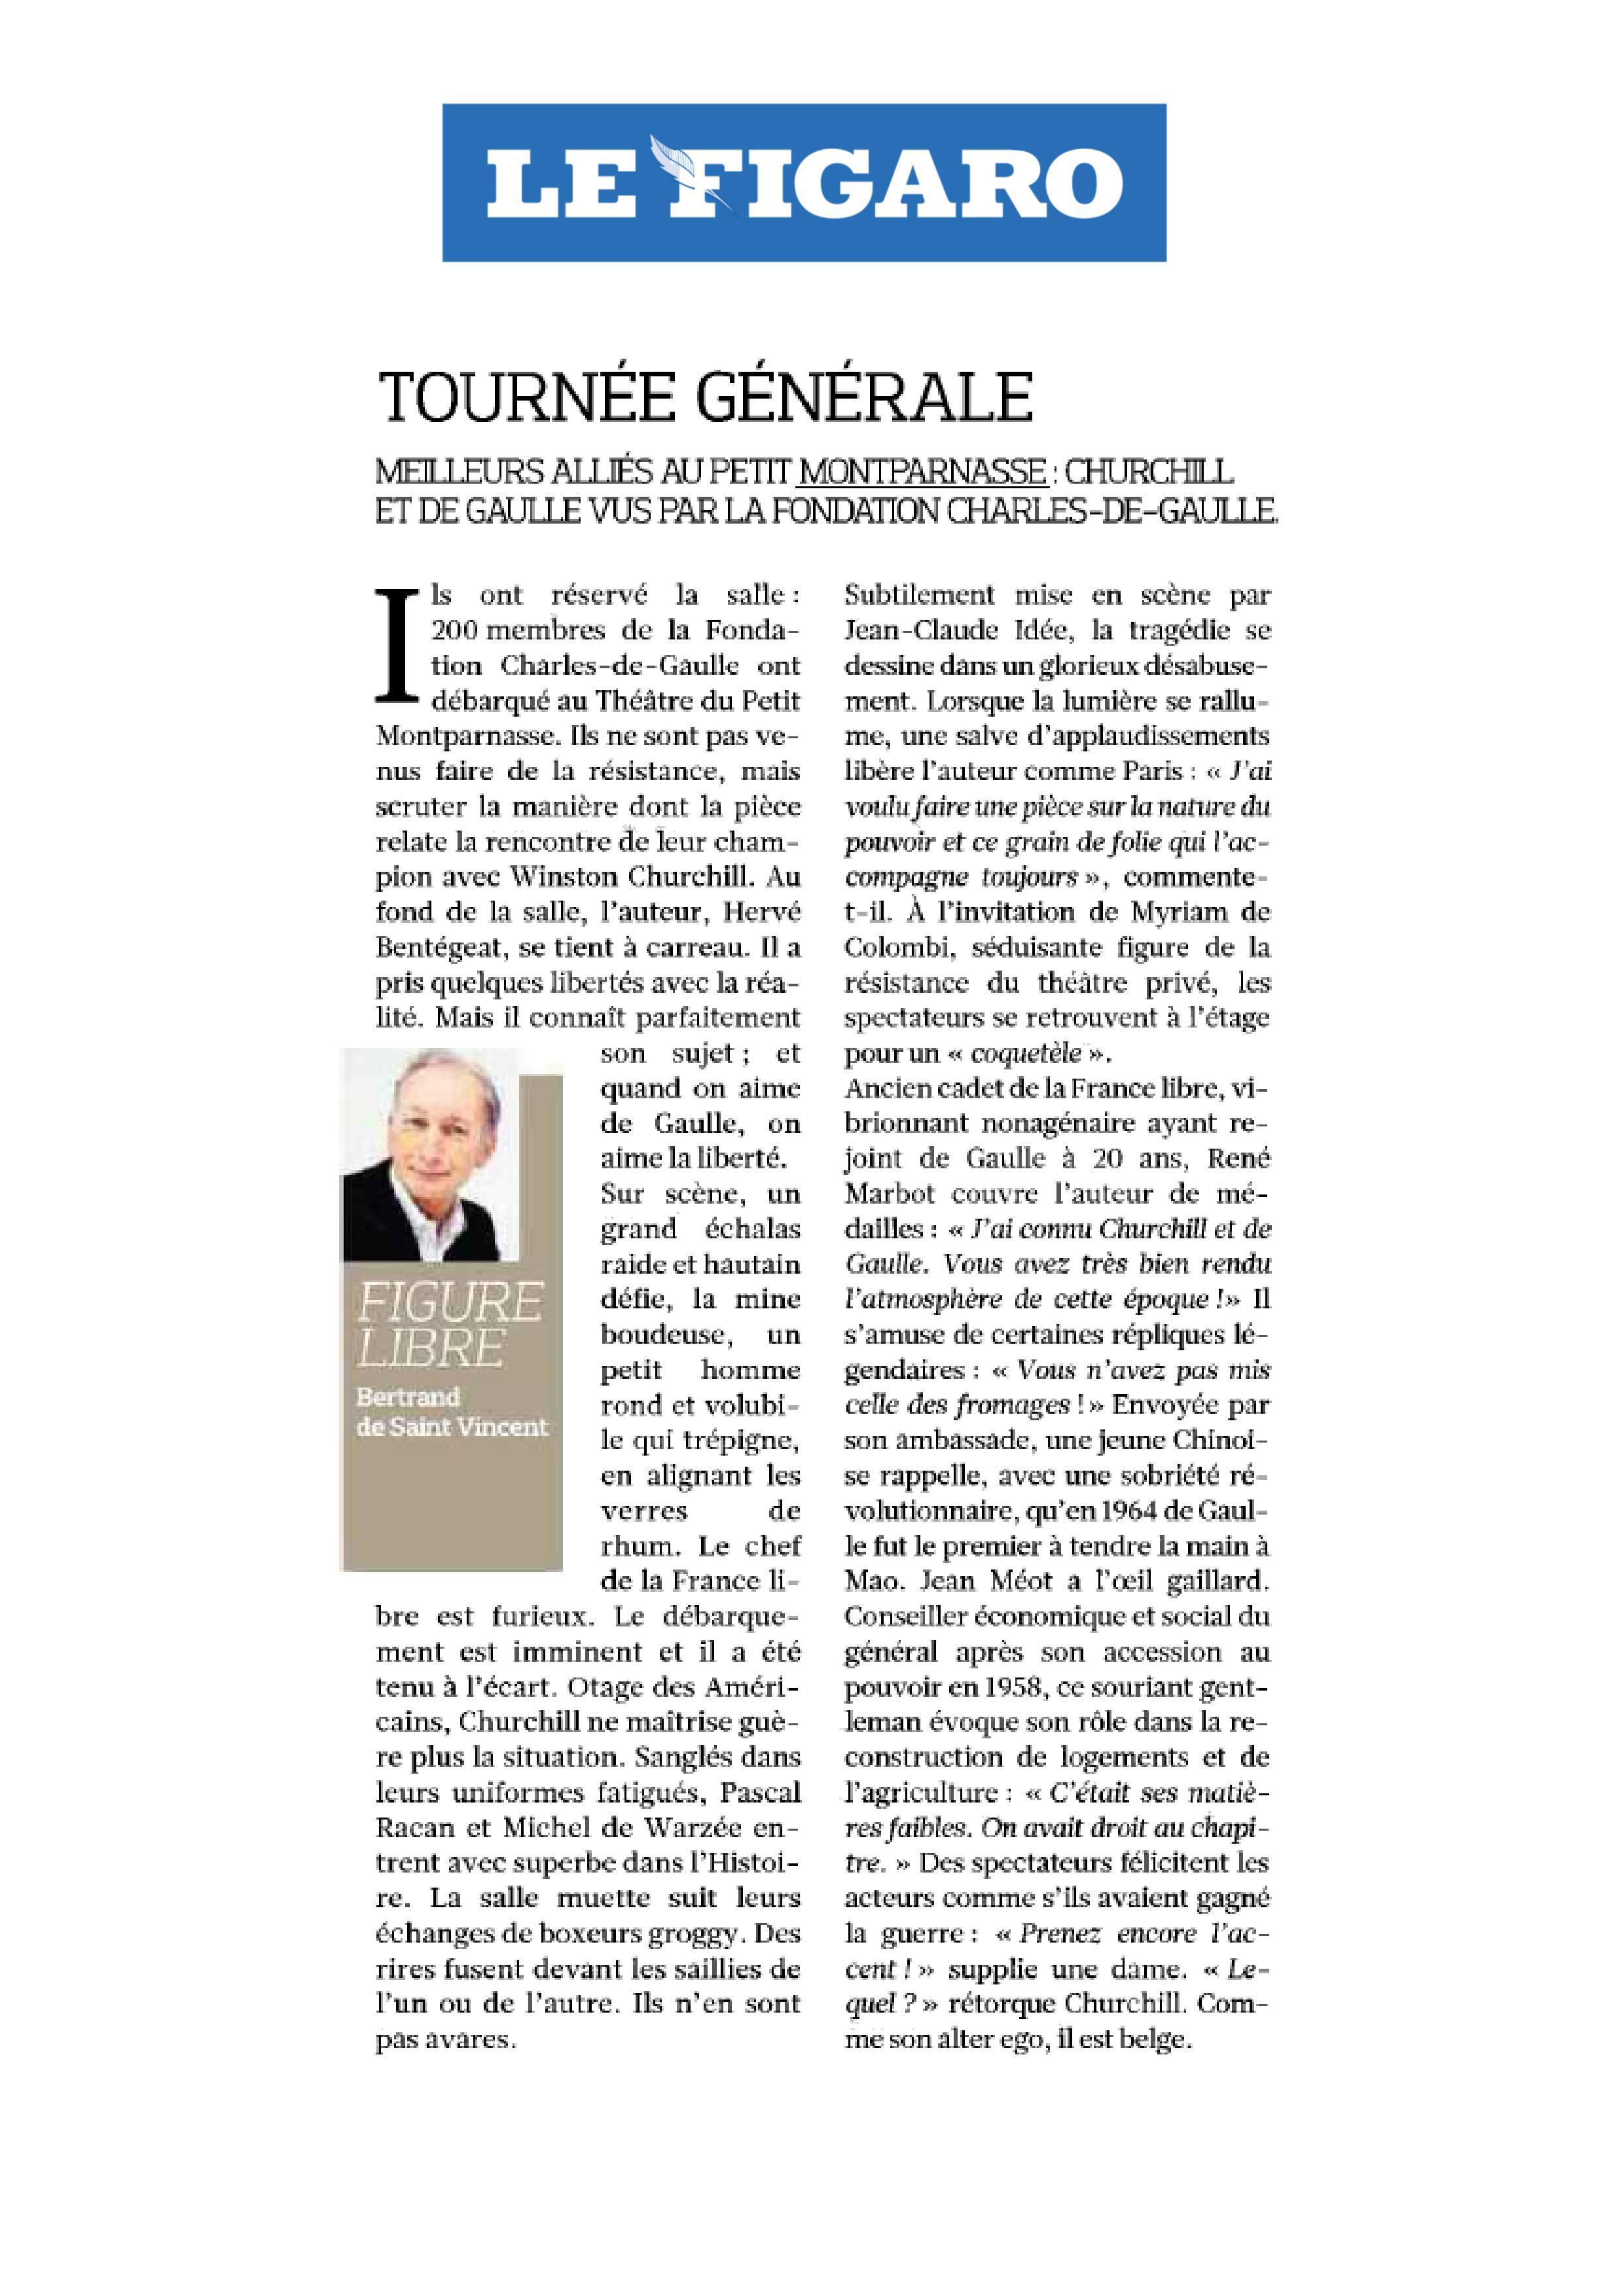 Le Figaro fondation de gaulle